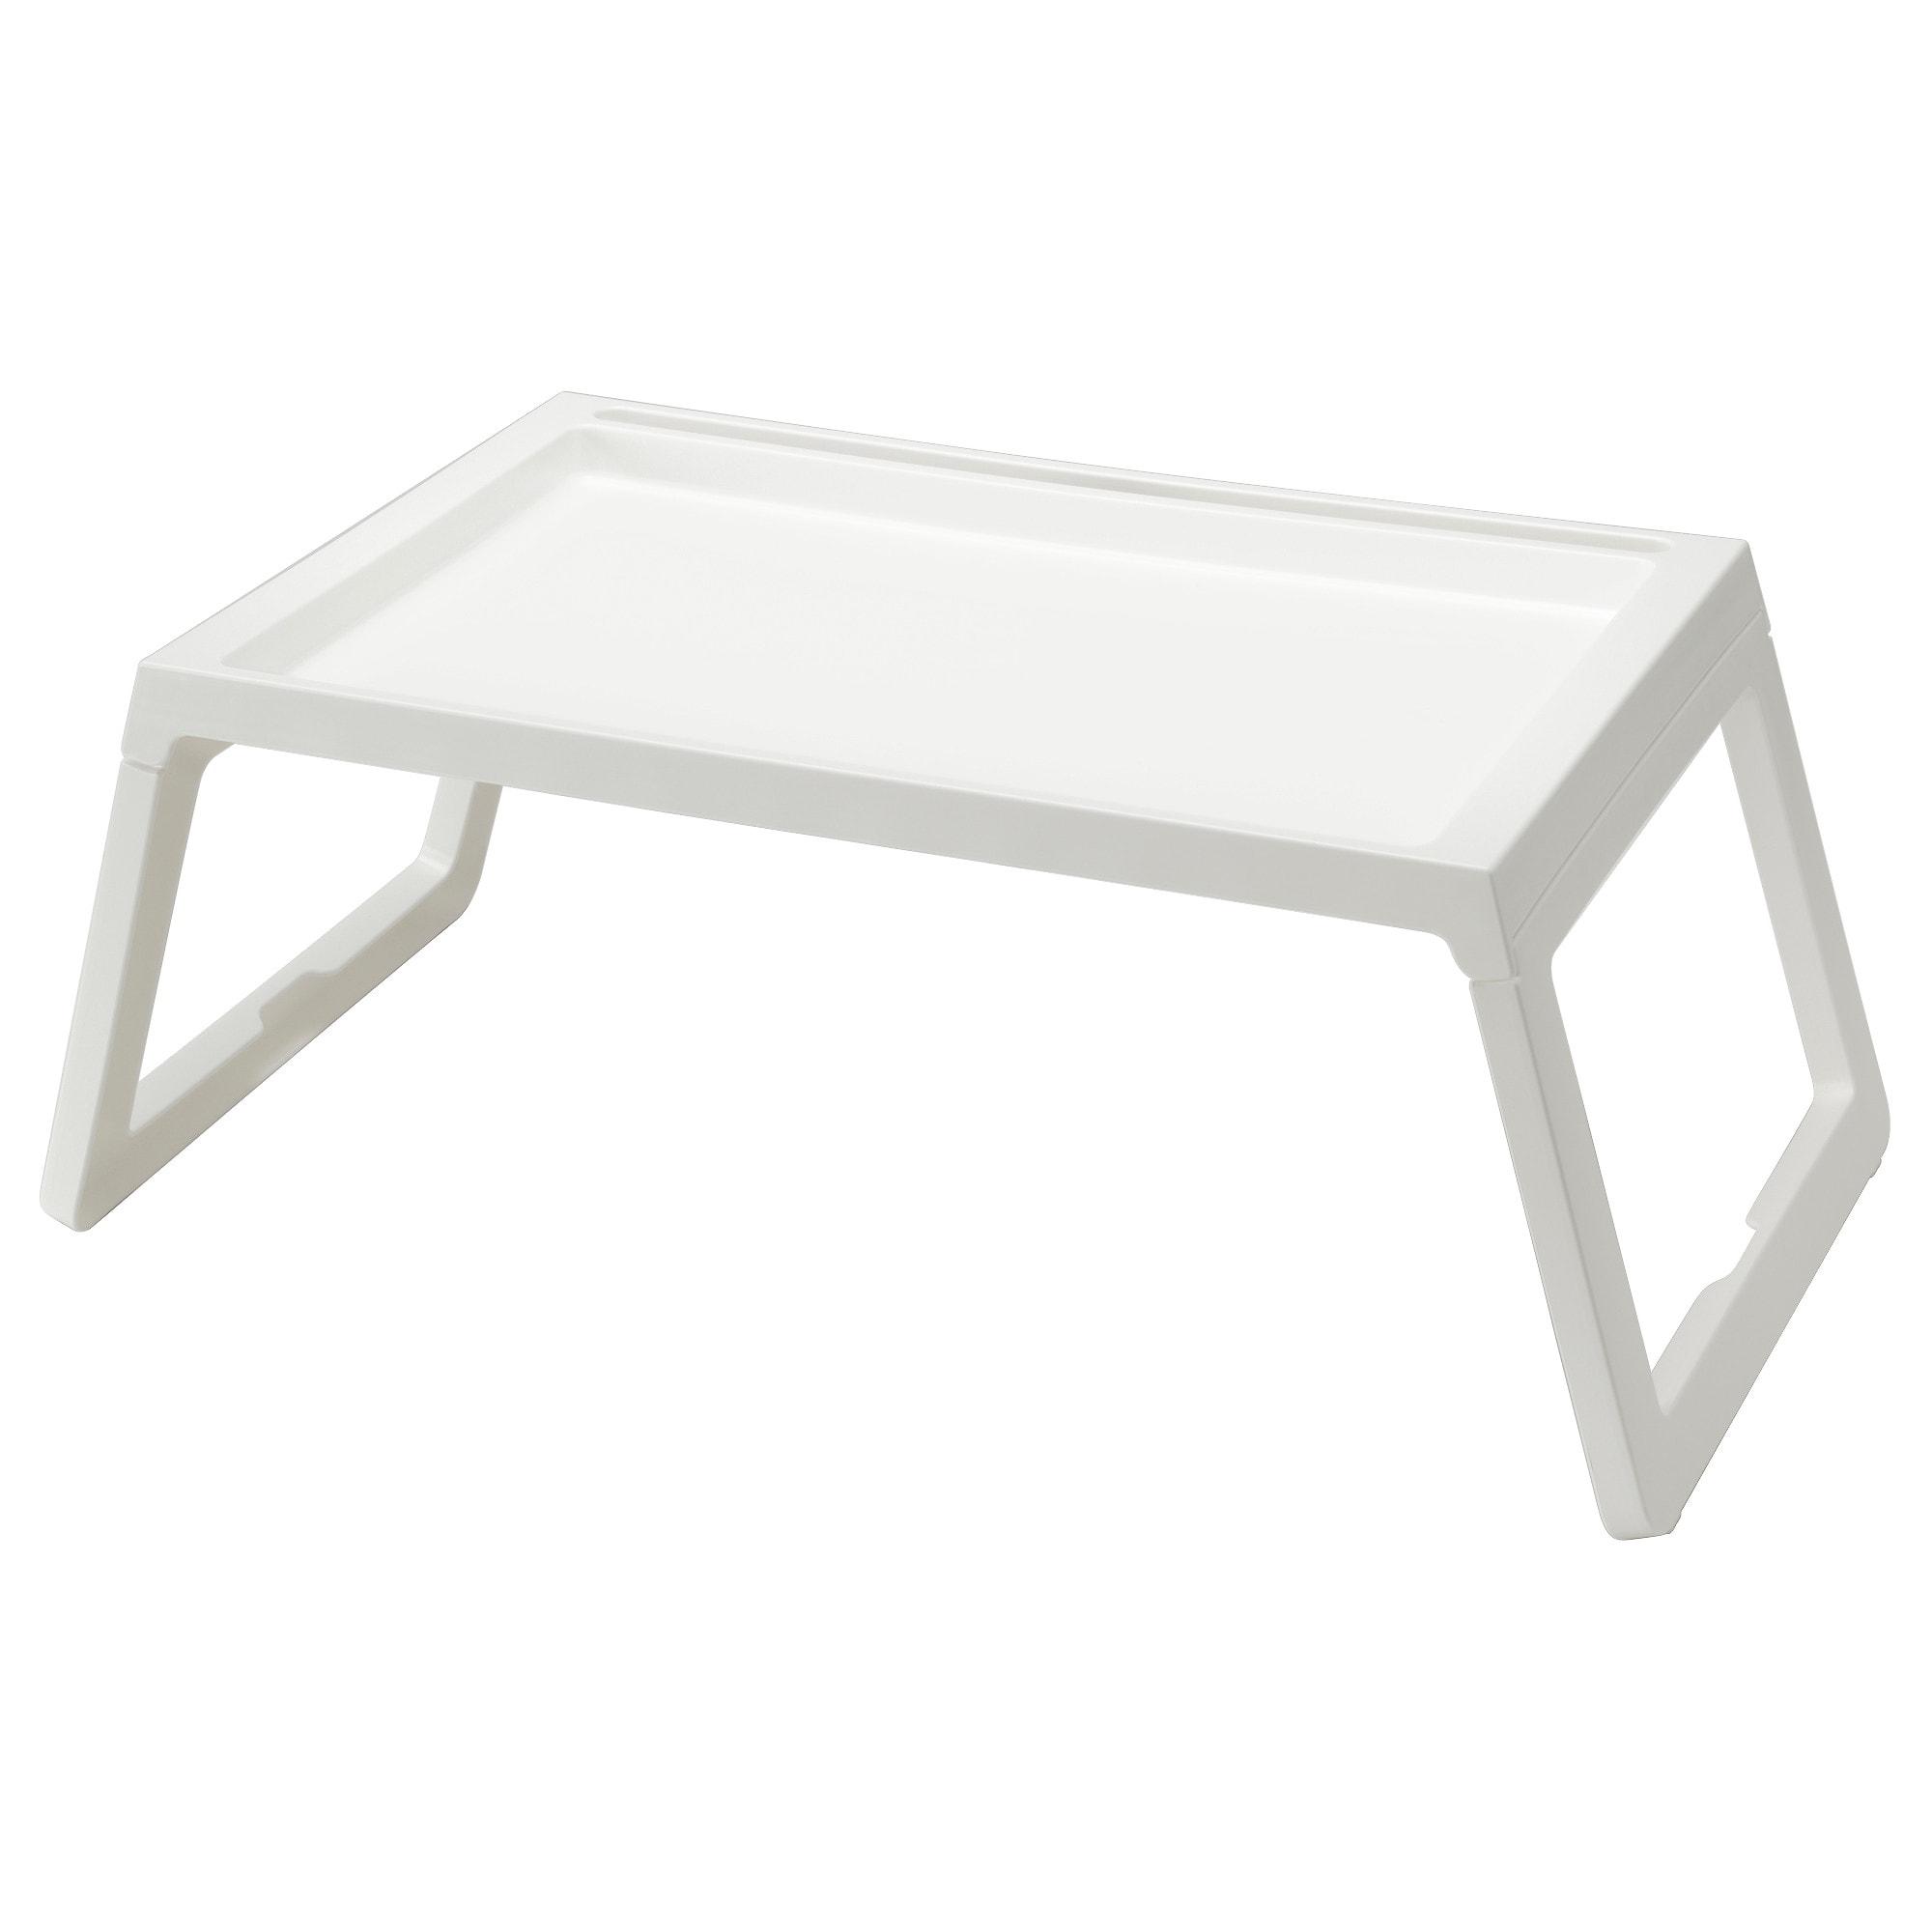 Klipsk Tavă Mic Dejun Alb Bed Tray Ikea Lap Tray